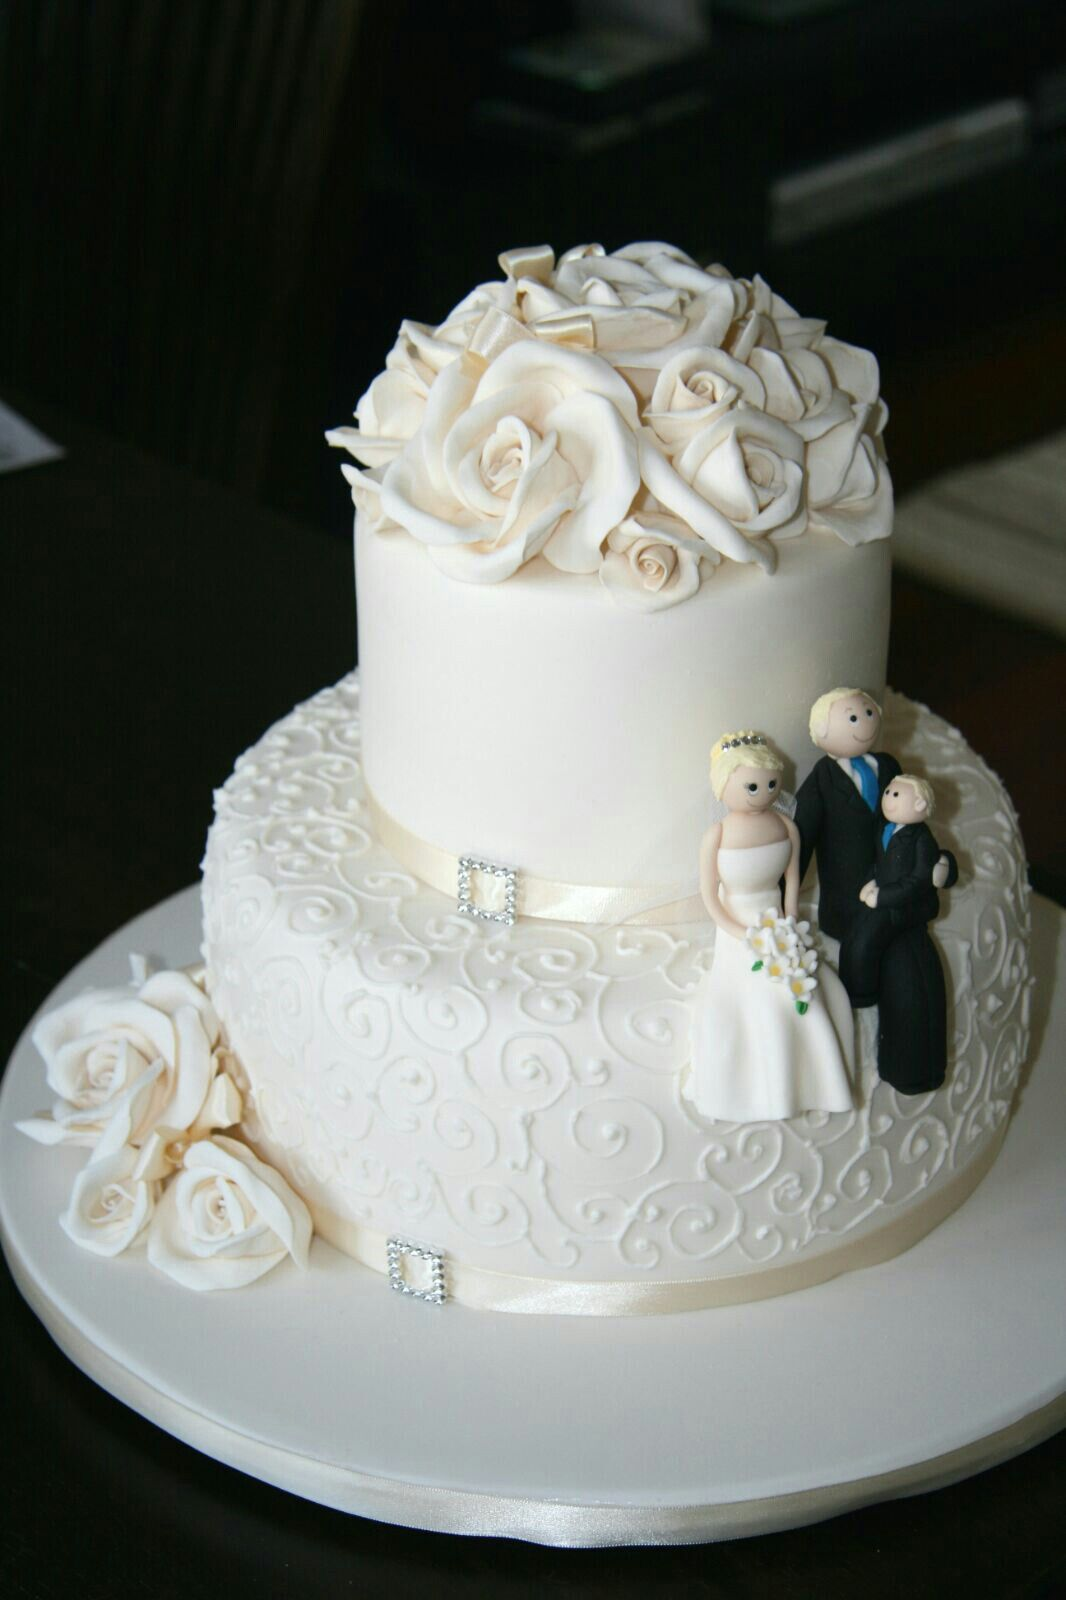 Pin by Sarah Dawkins on Cakes | Pinterest | Wedding cake and Cake